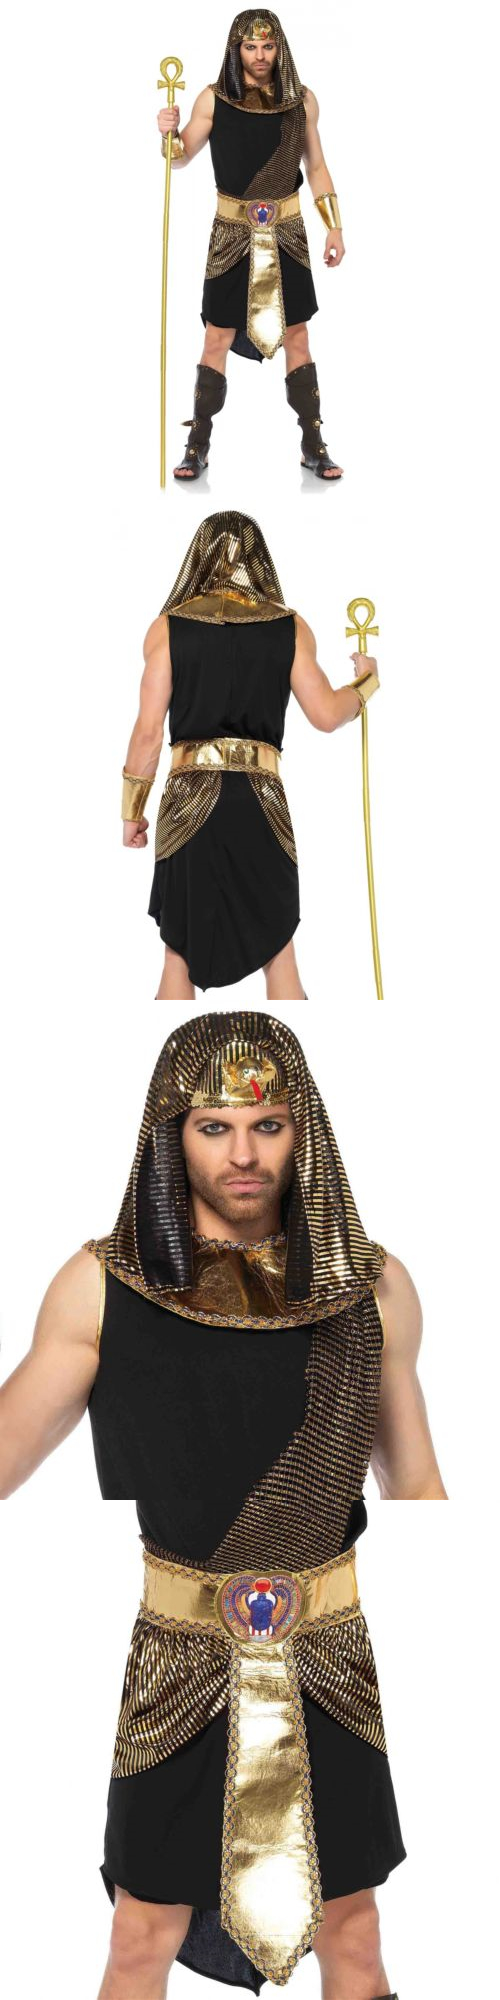 halloween costumes men king tut costume adult egyptian pharoah god halloween fancy dress